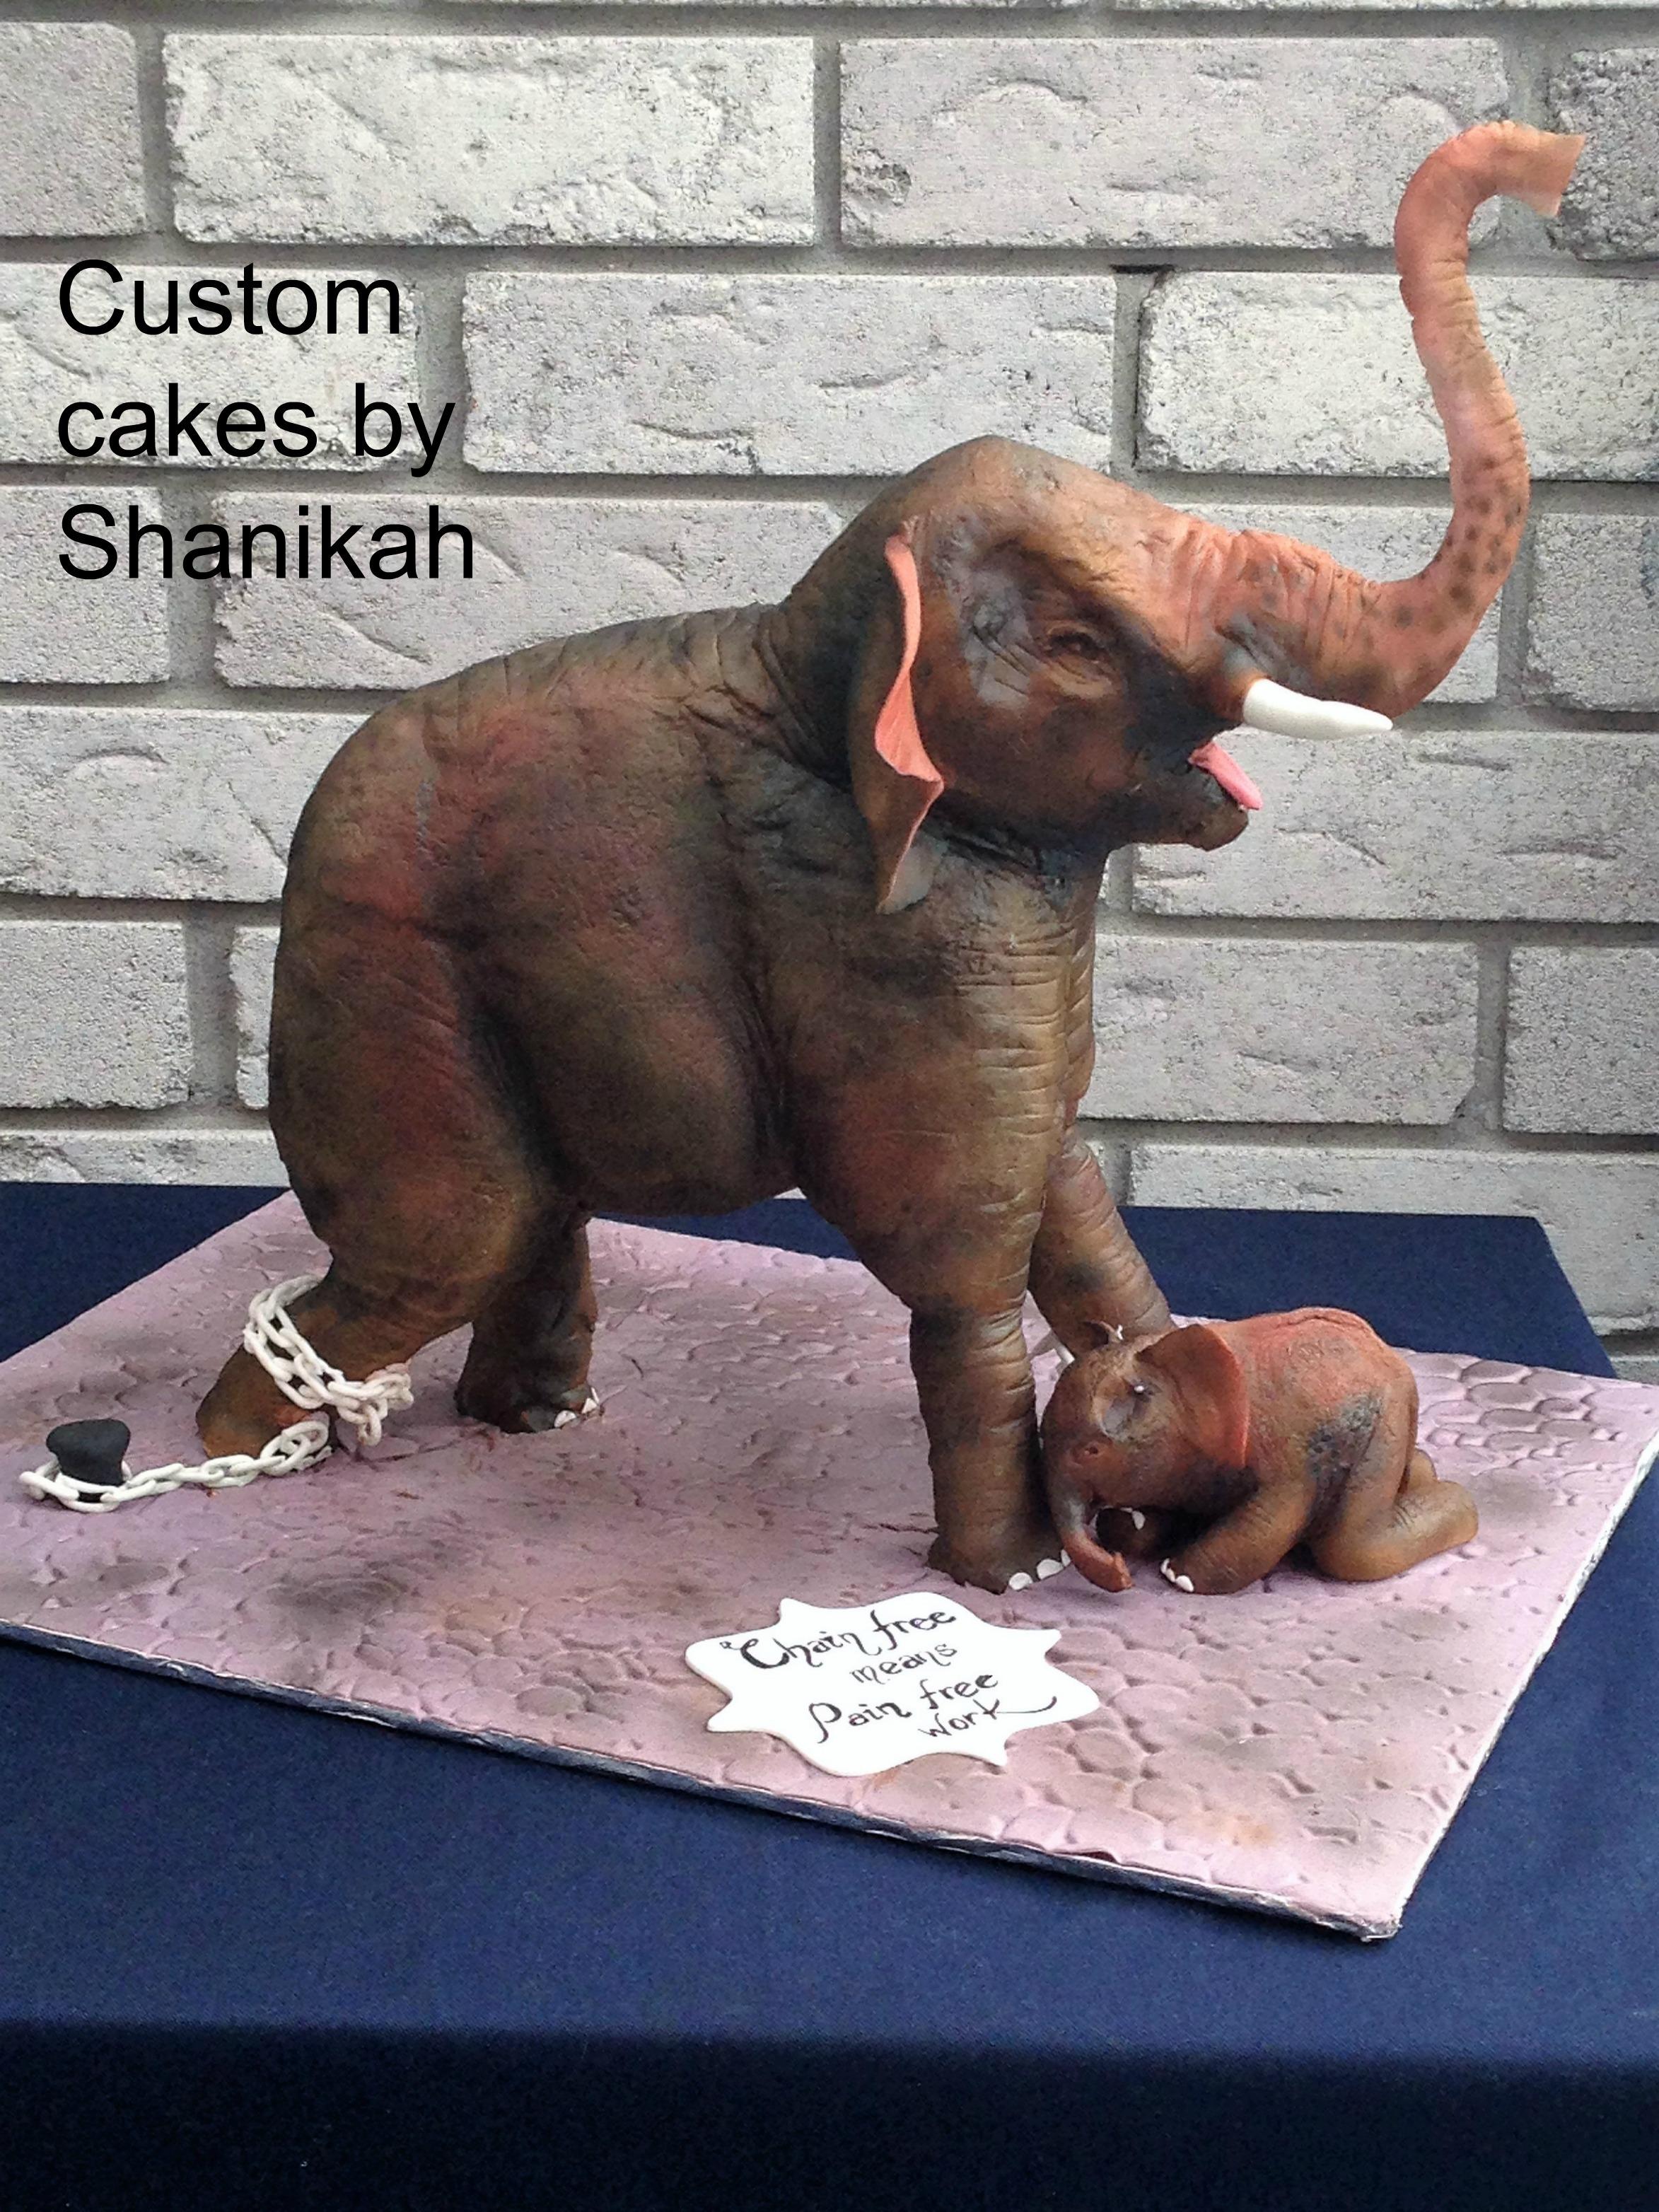 Animal-Rights-Shanikah-Fernando-Custom-Cakes-by-Shanikah-The-Asian-Elephant.jpg#asset:13736